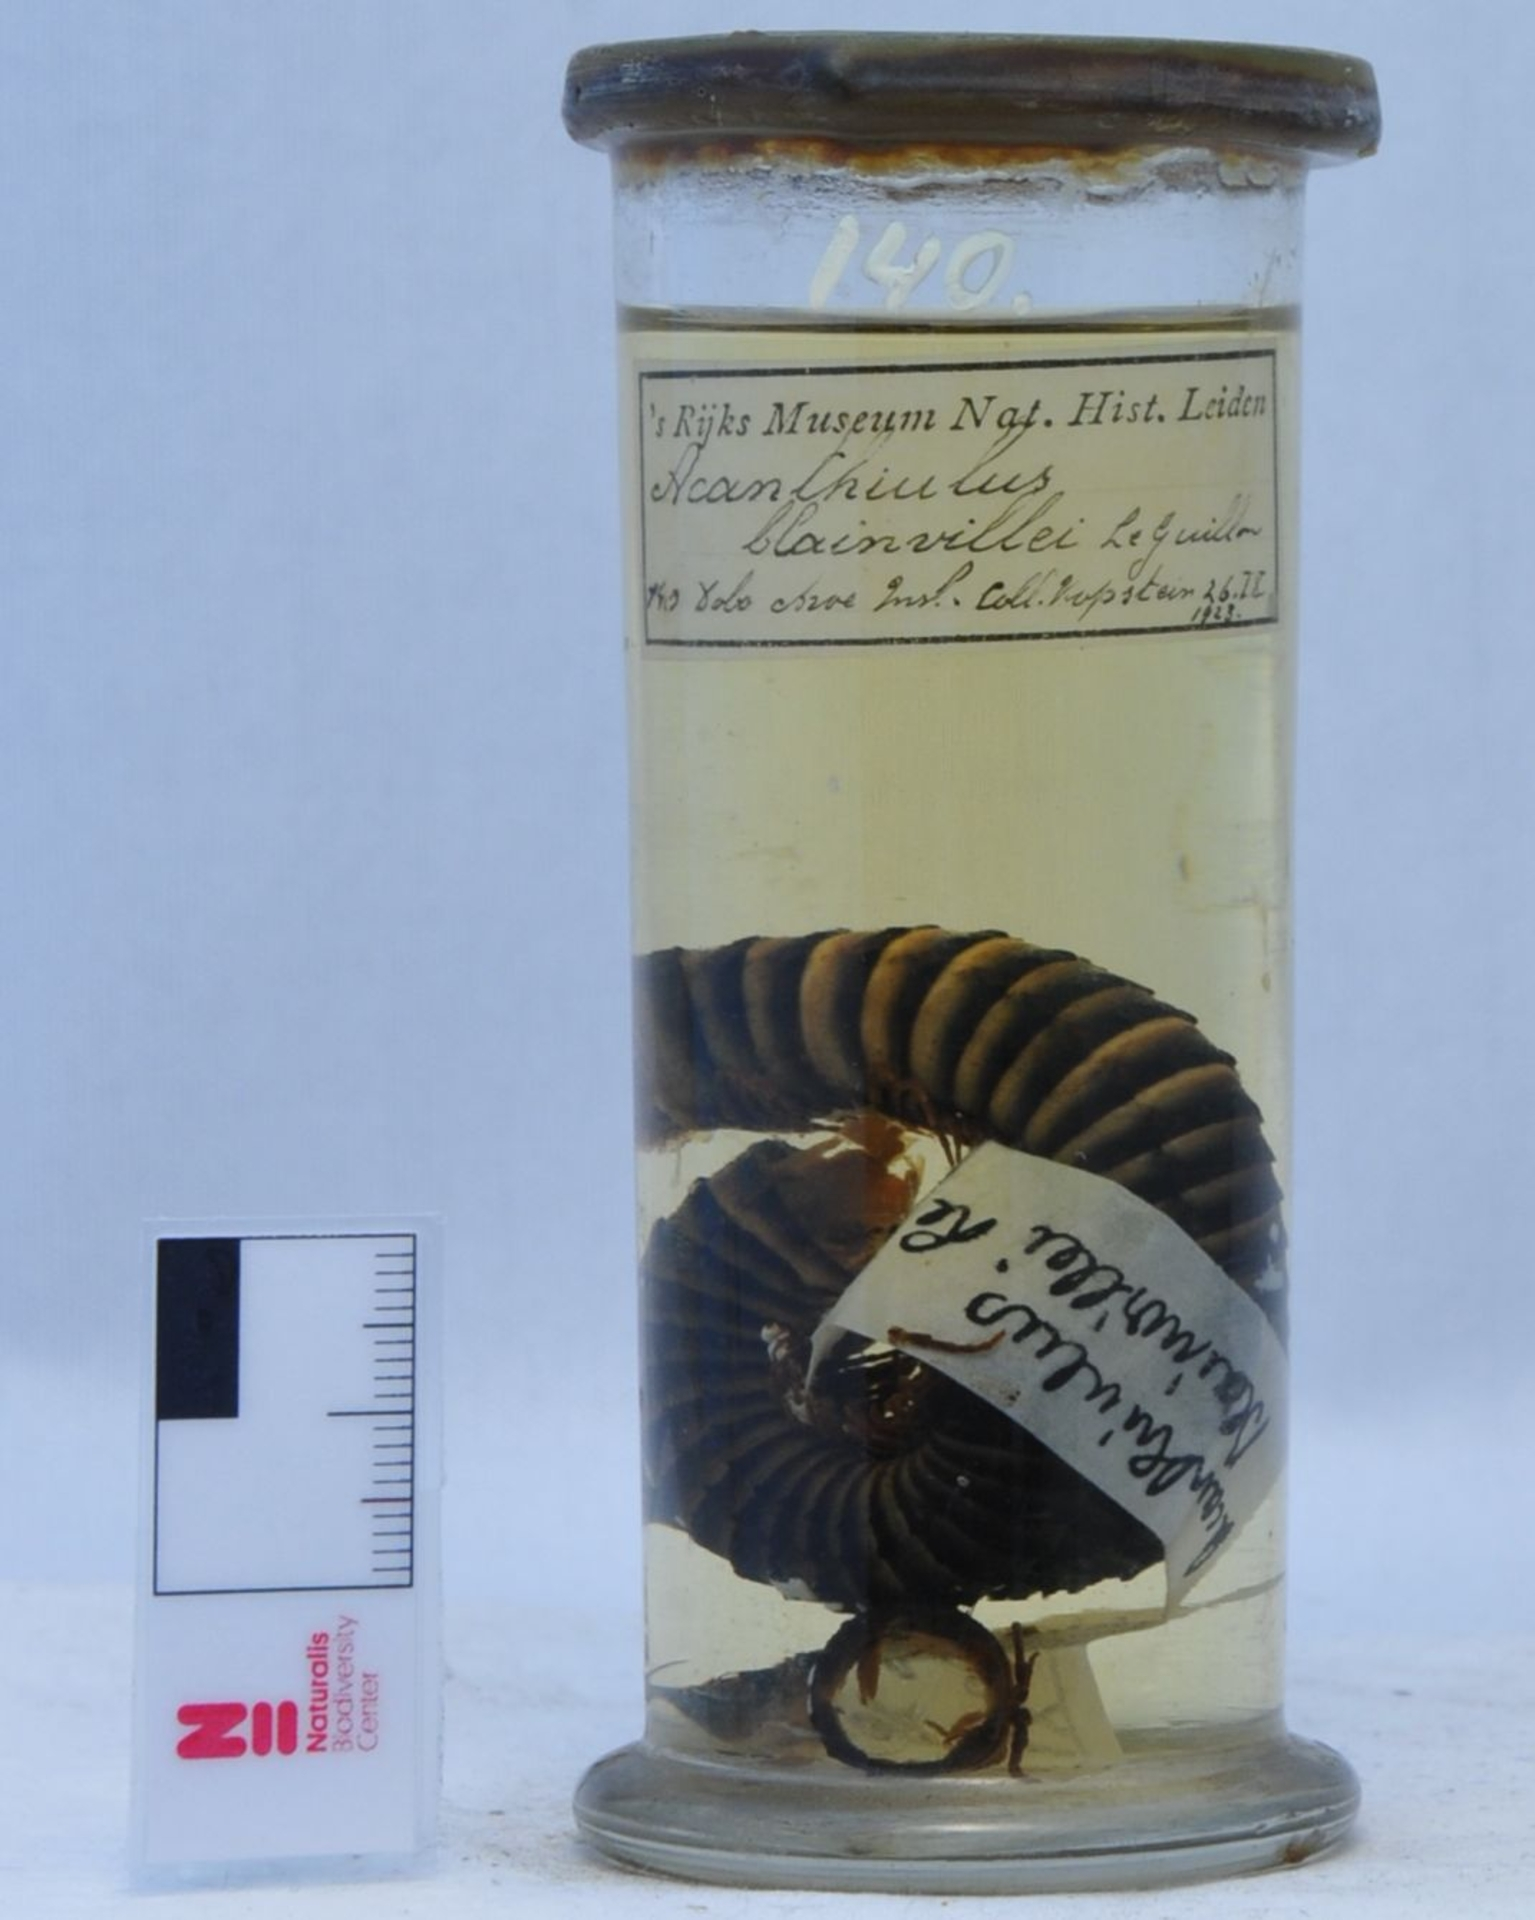 RMNH.DIP.140   Acanthiulus blainvillei Le Guillon